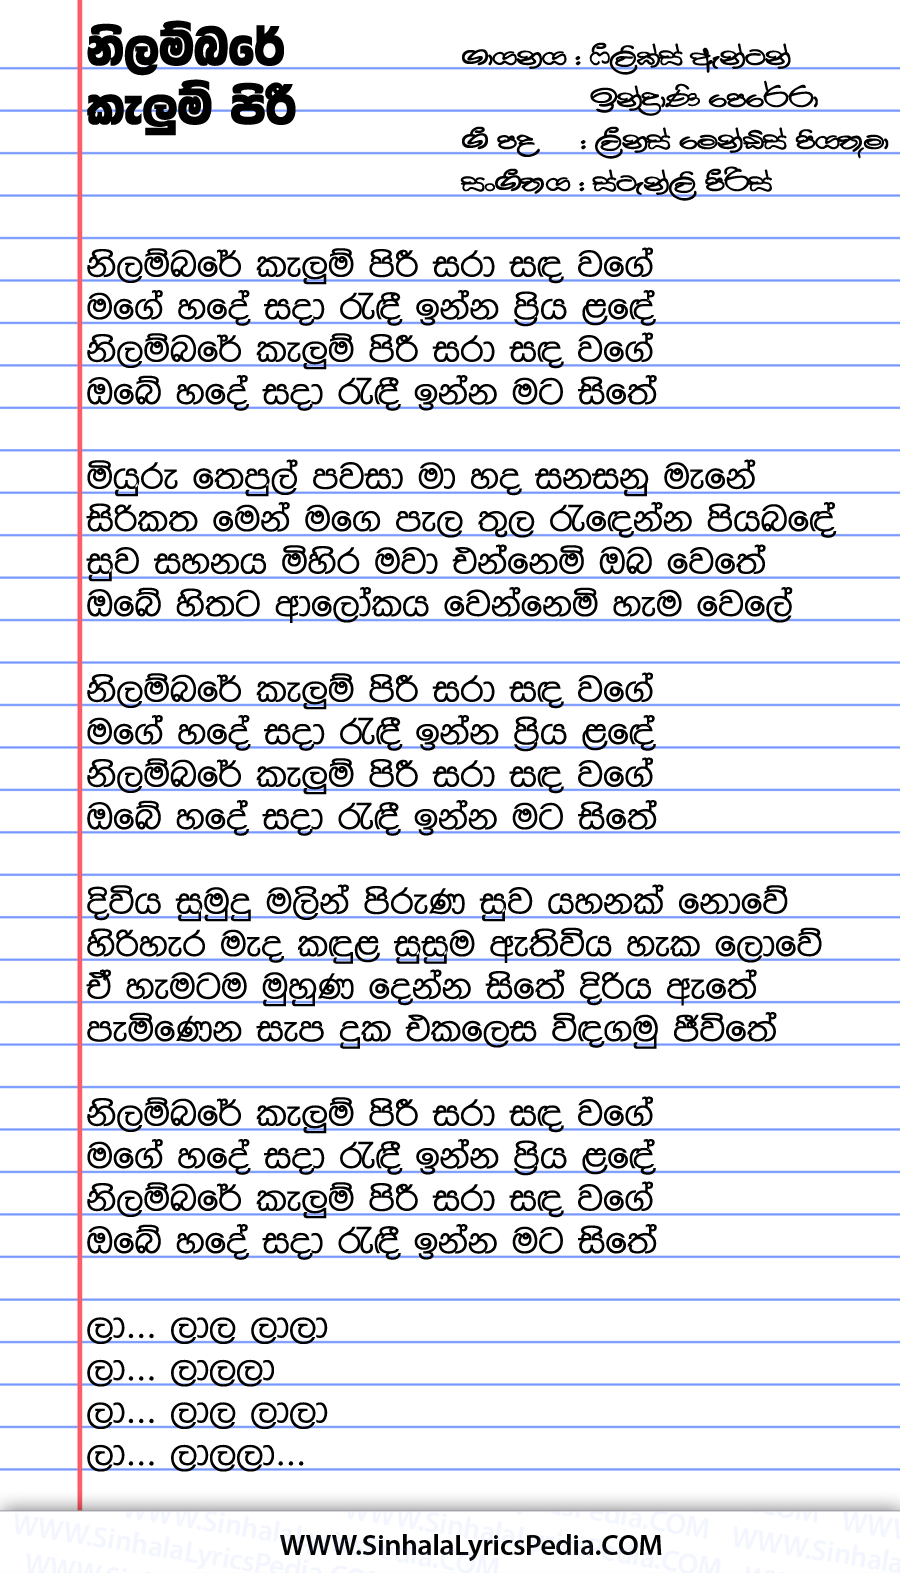 Nilambare Kalum Piri Sara Sanda Wage Song Lyrics